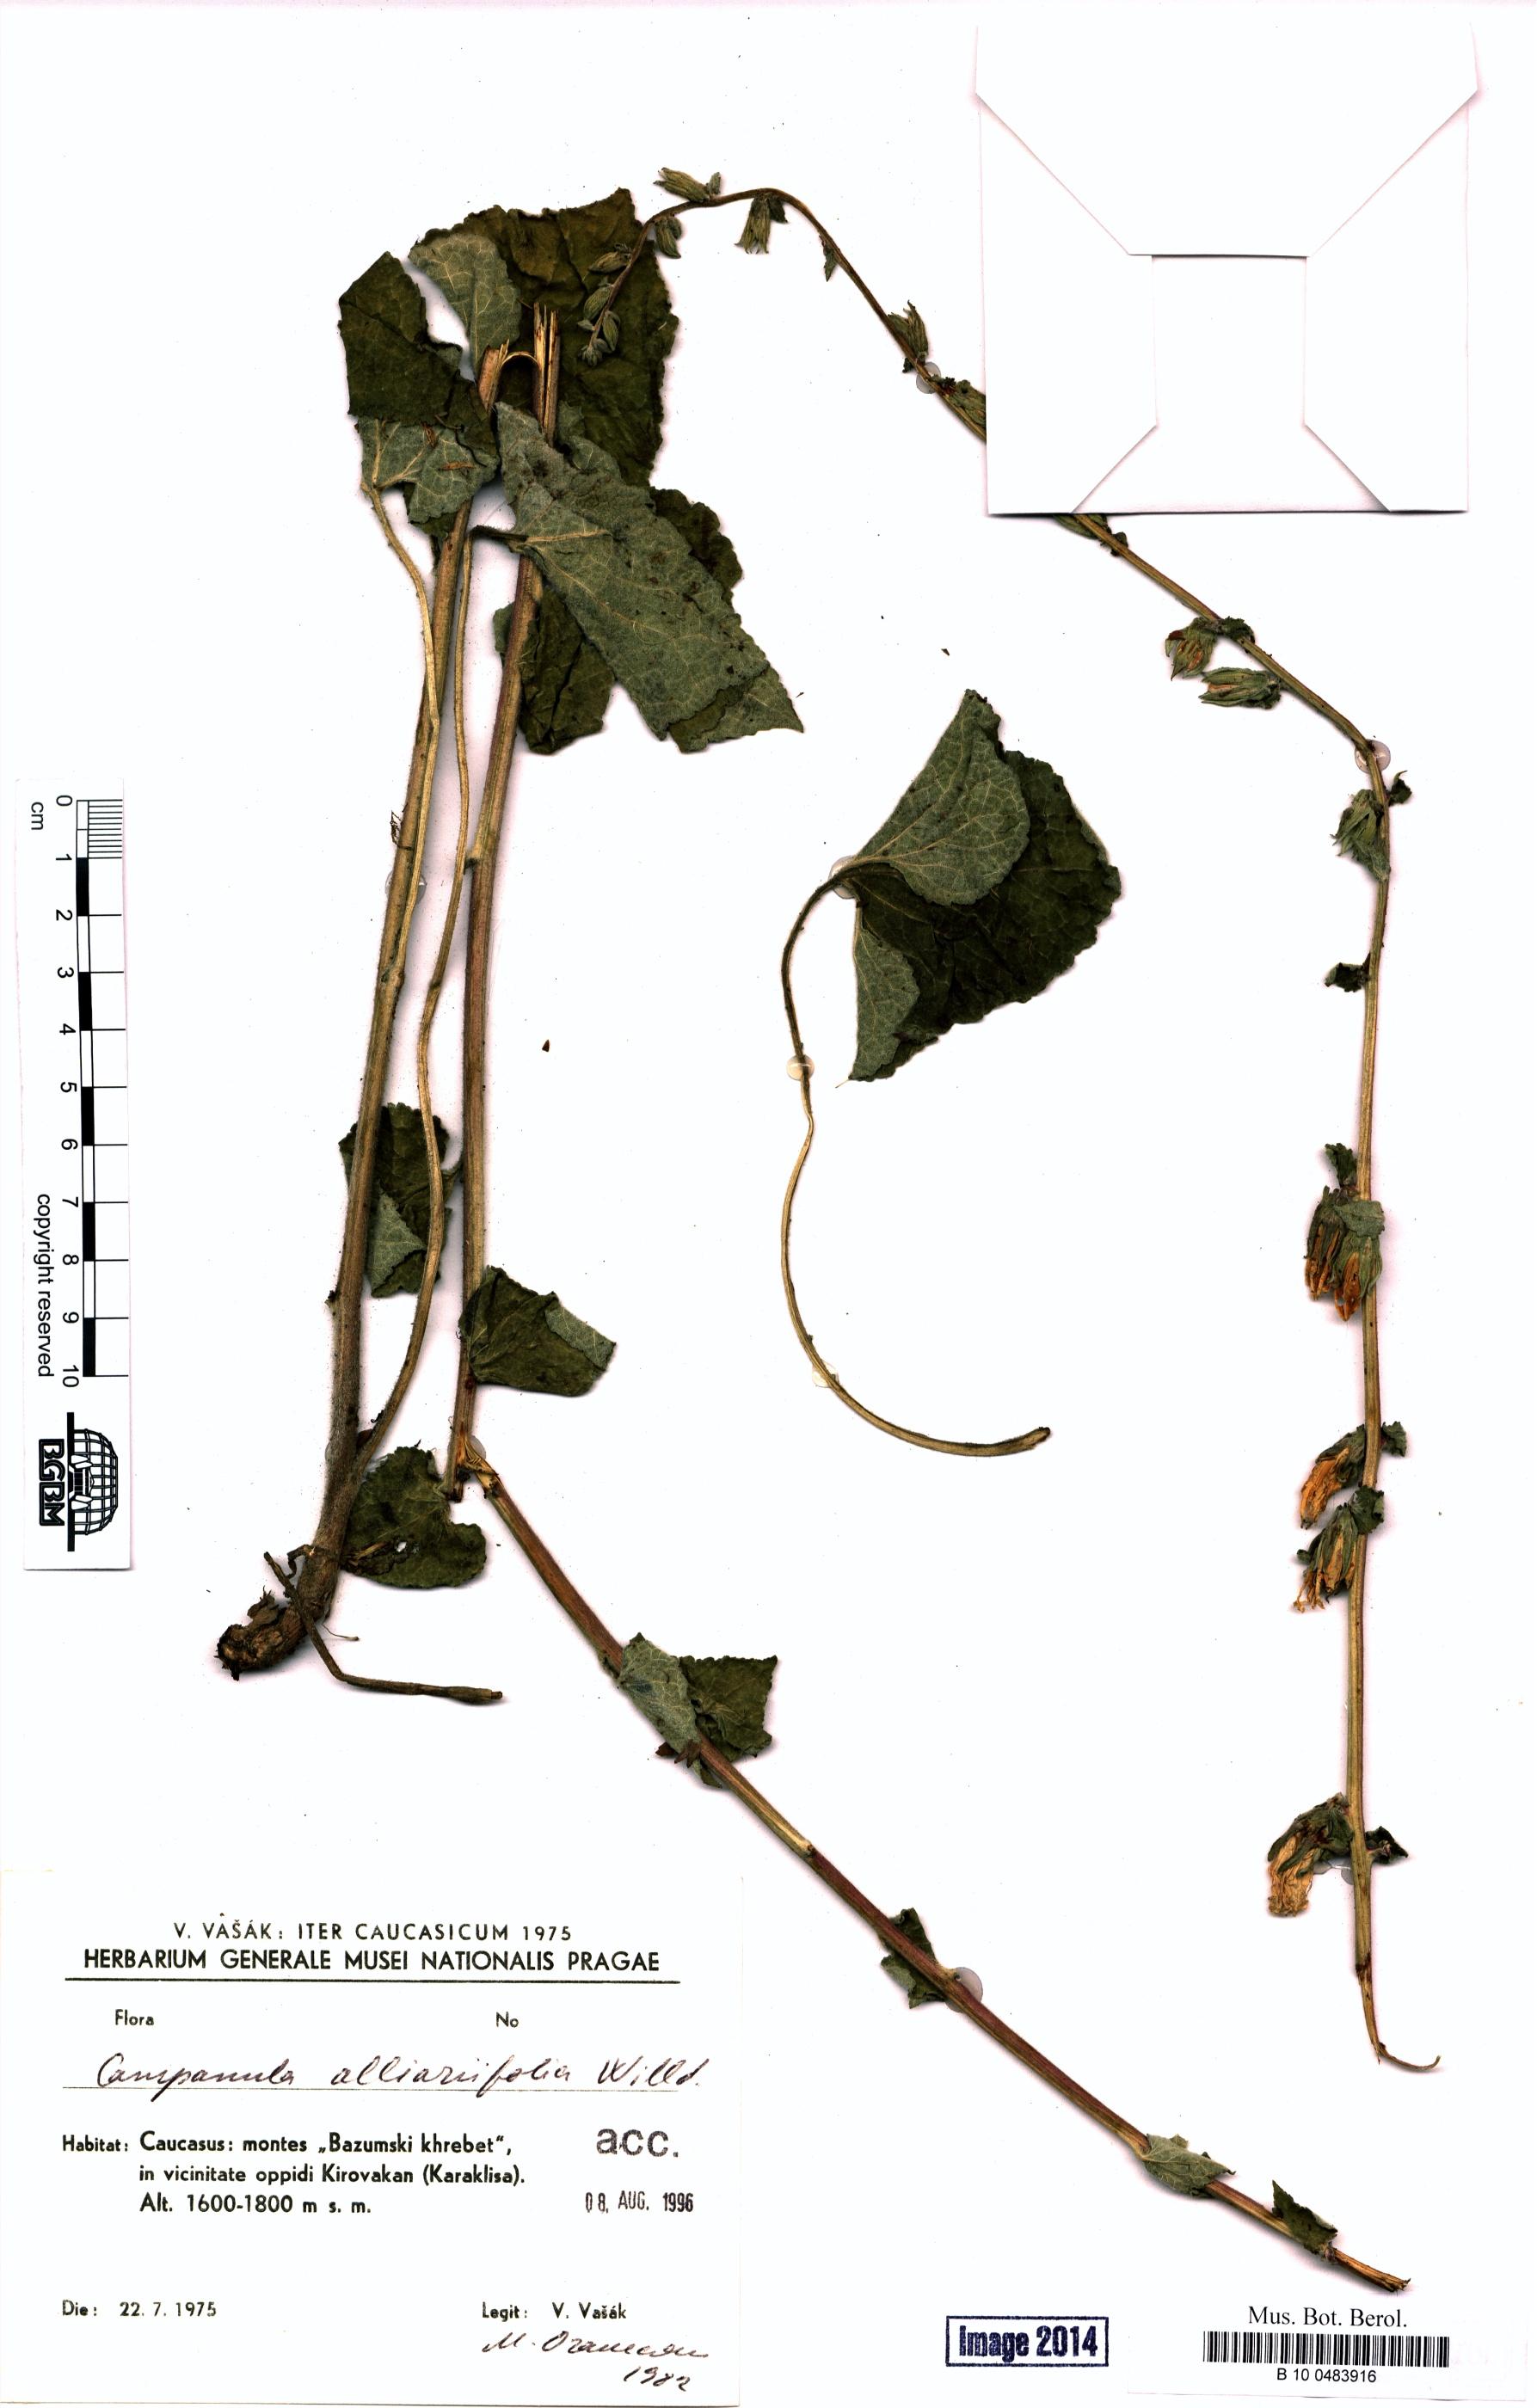 http://ww2.bgbm.org/herbarium/images/B/10/04/83/91/B_10_0483916.jpg